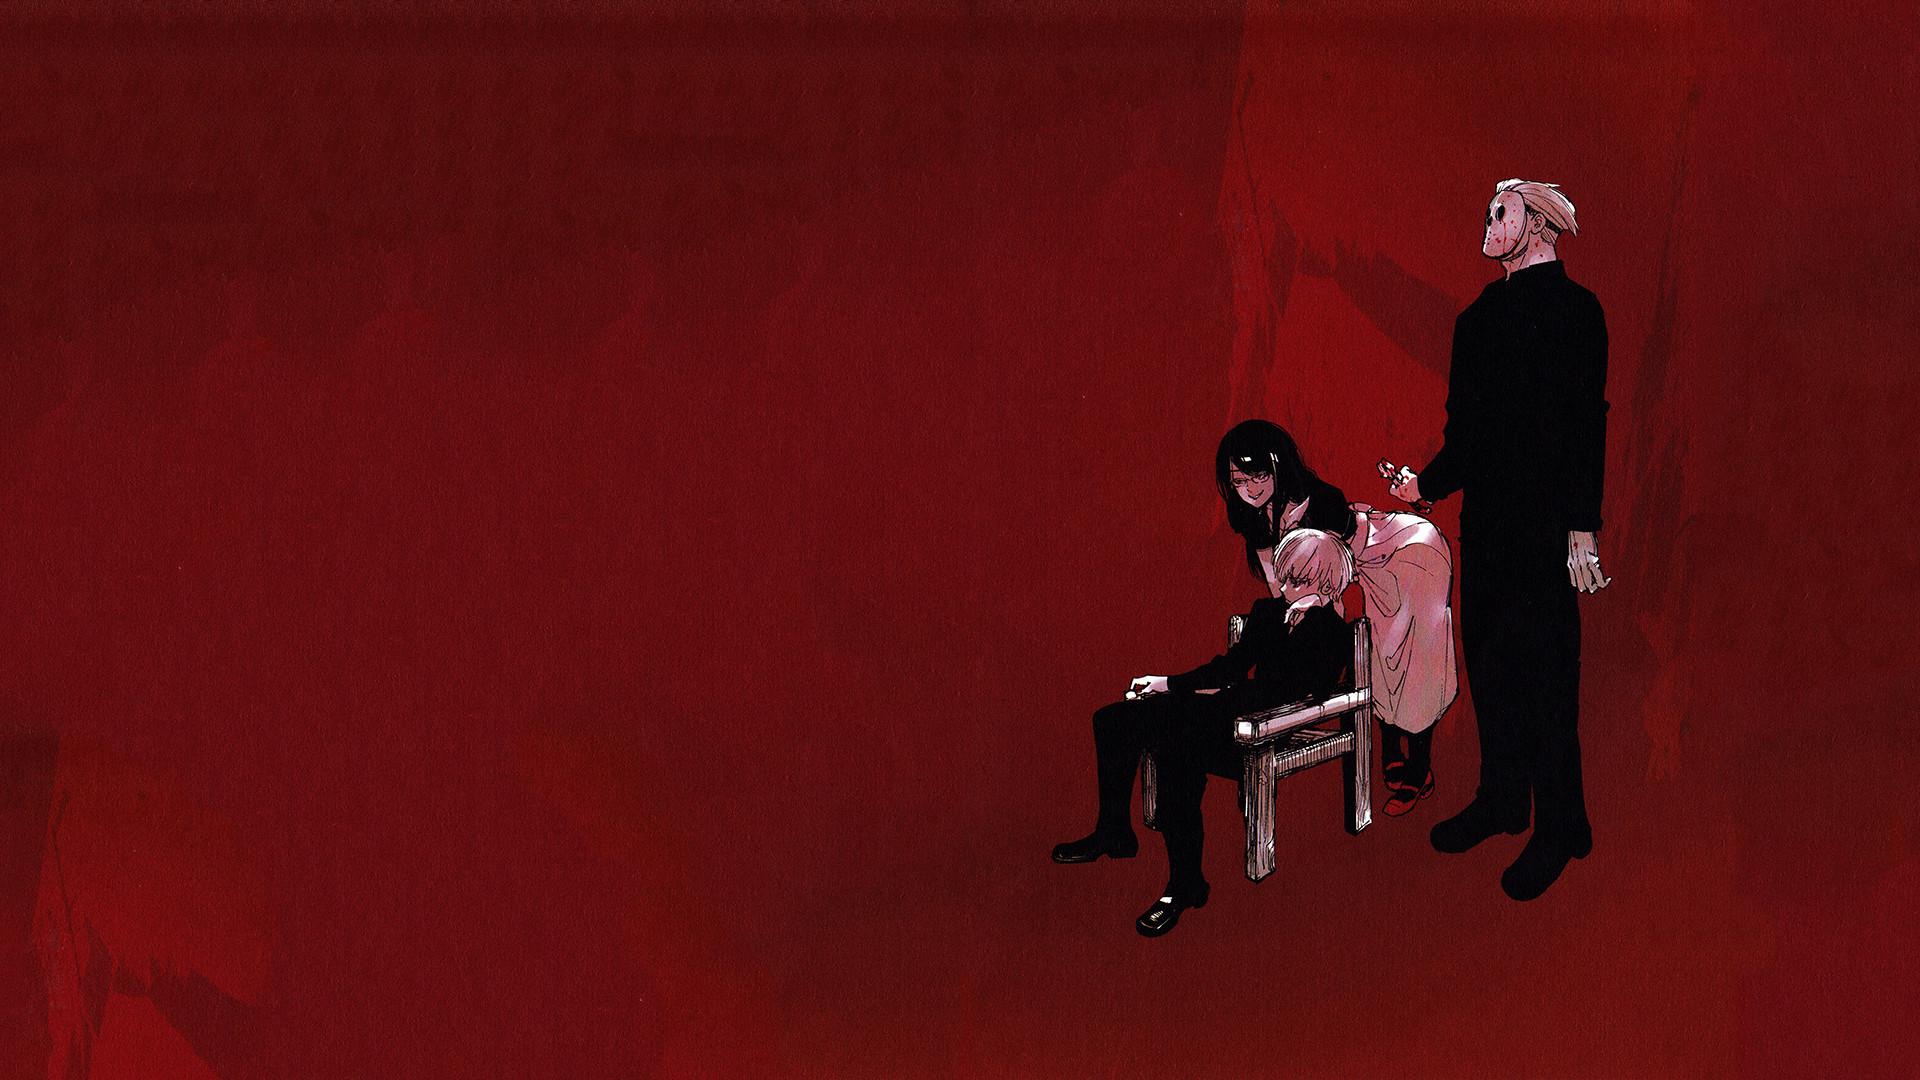 Anime – Tokyo Ghoul Rize Kamishiro Ken Kaneki Yakumo Oomori Wallpaper